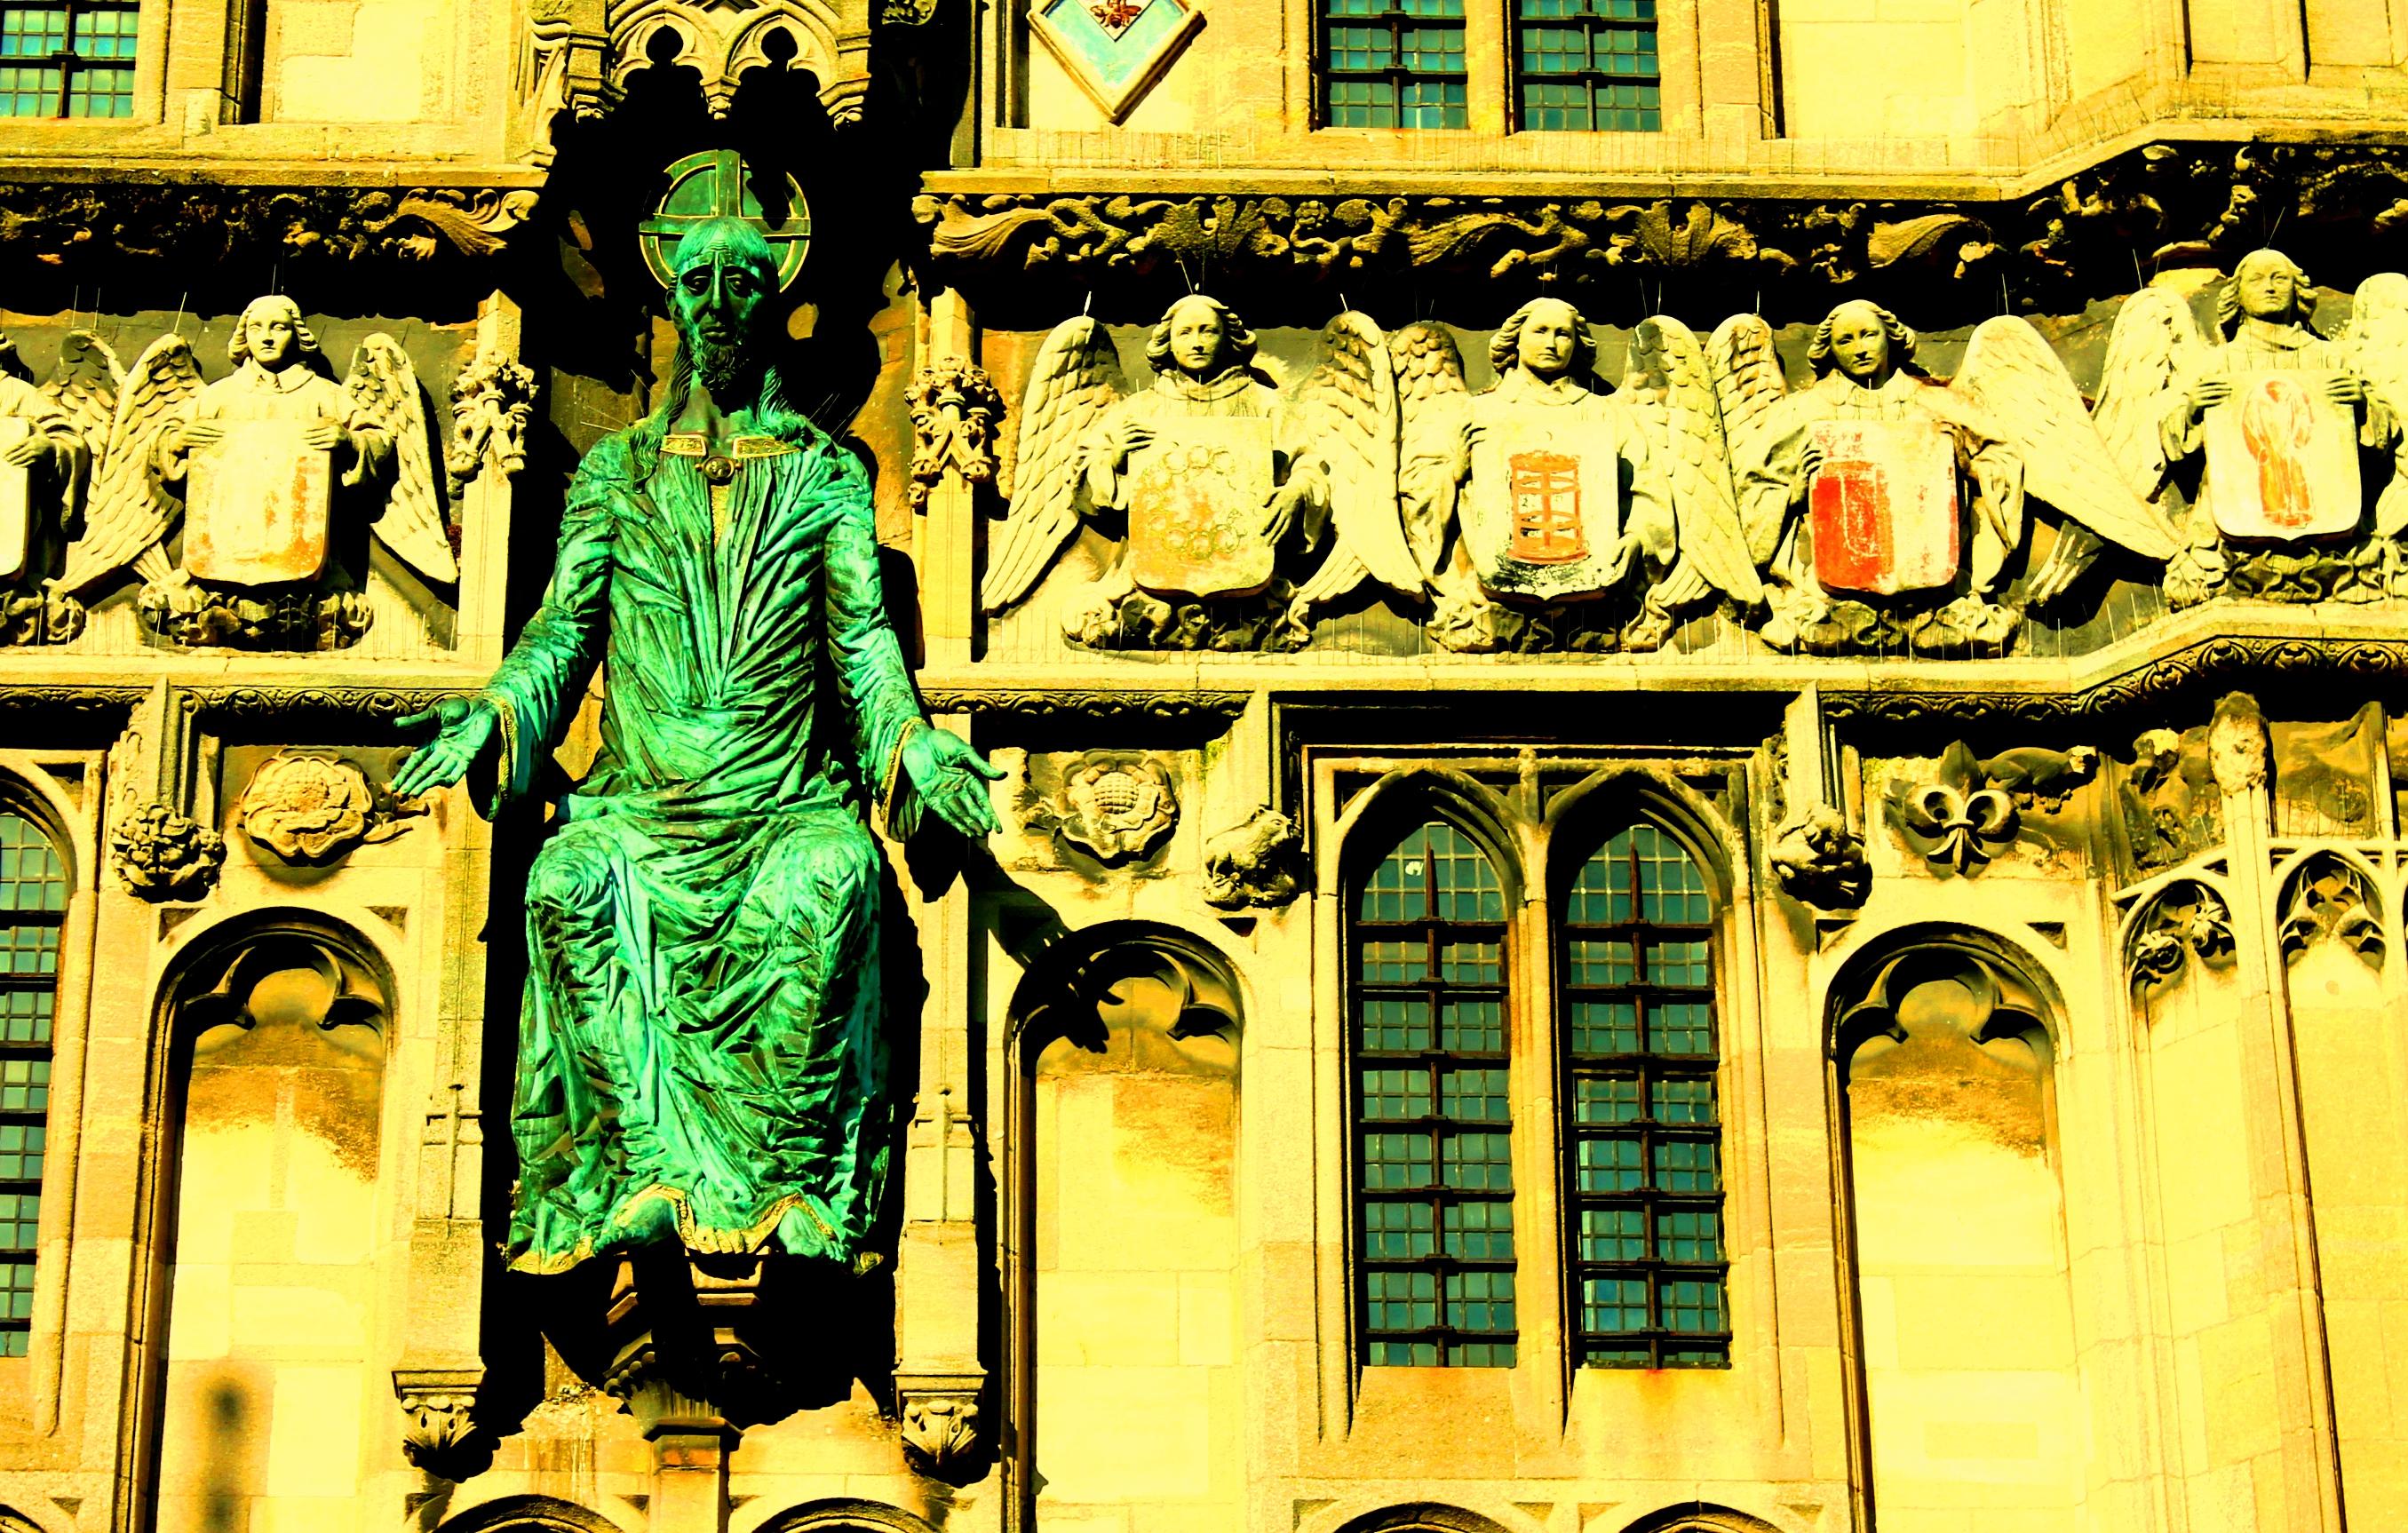 Free Images : architecture, window, palace, explore, canon, landmark ...